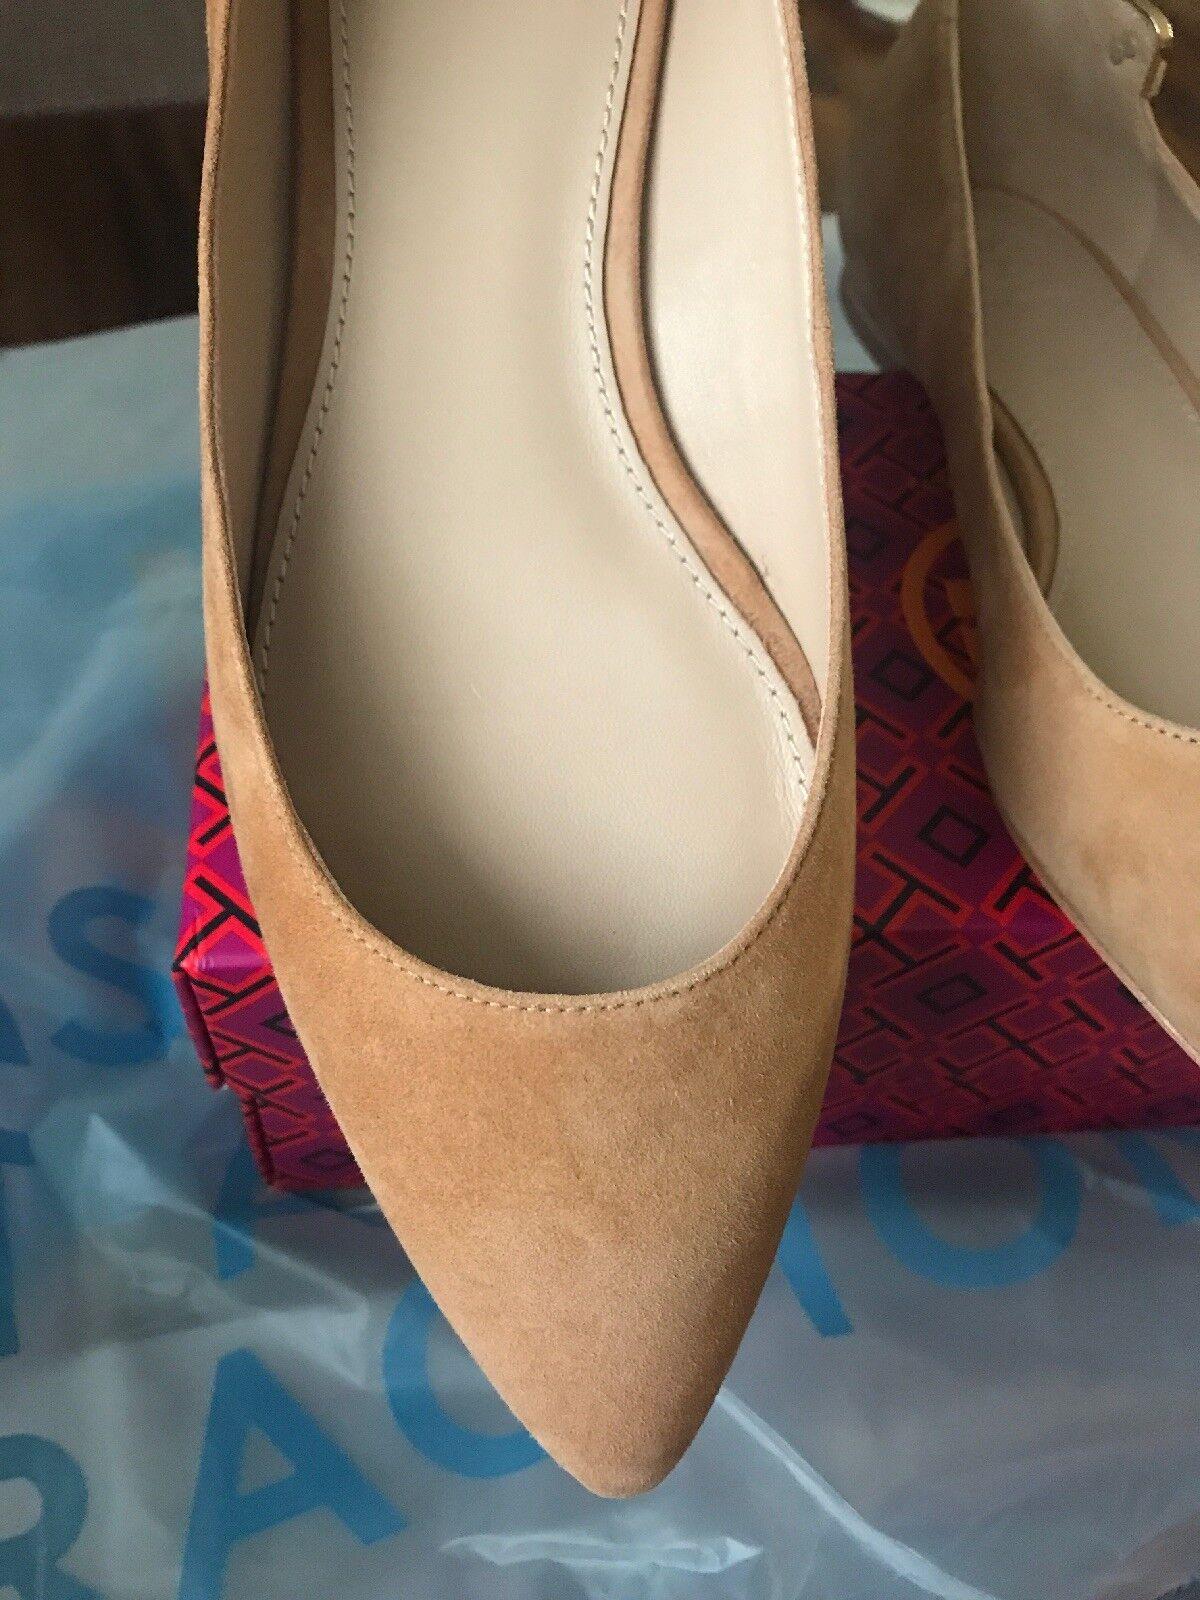 BRAND NEW IN IN IN BOX TORY BURCH  ELIZABETH SUEDE  BALLET FLAT  SIZE 7.5 42a580